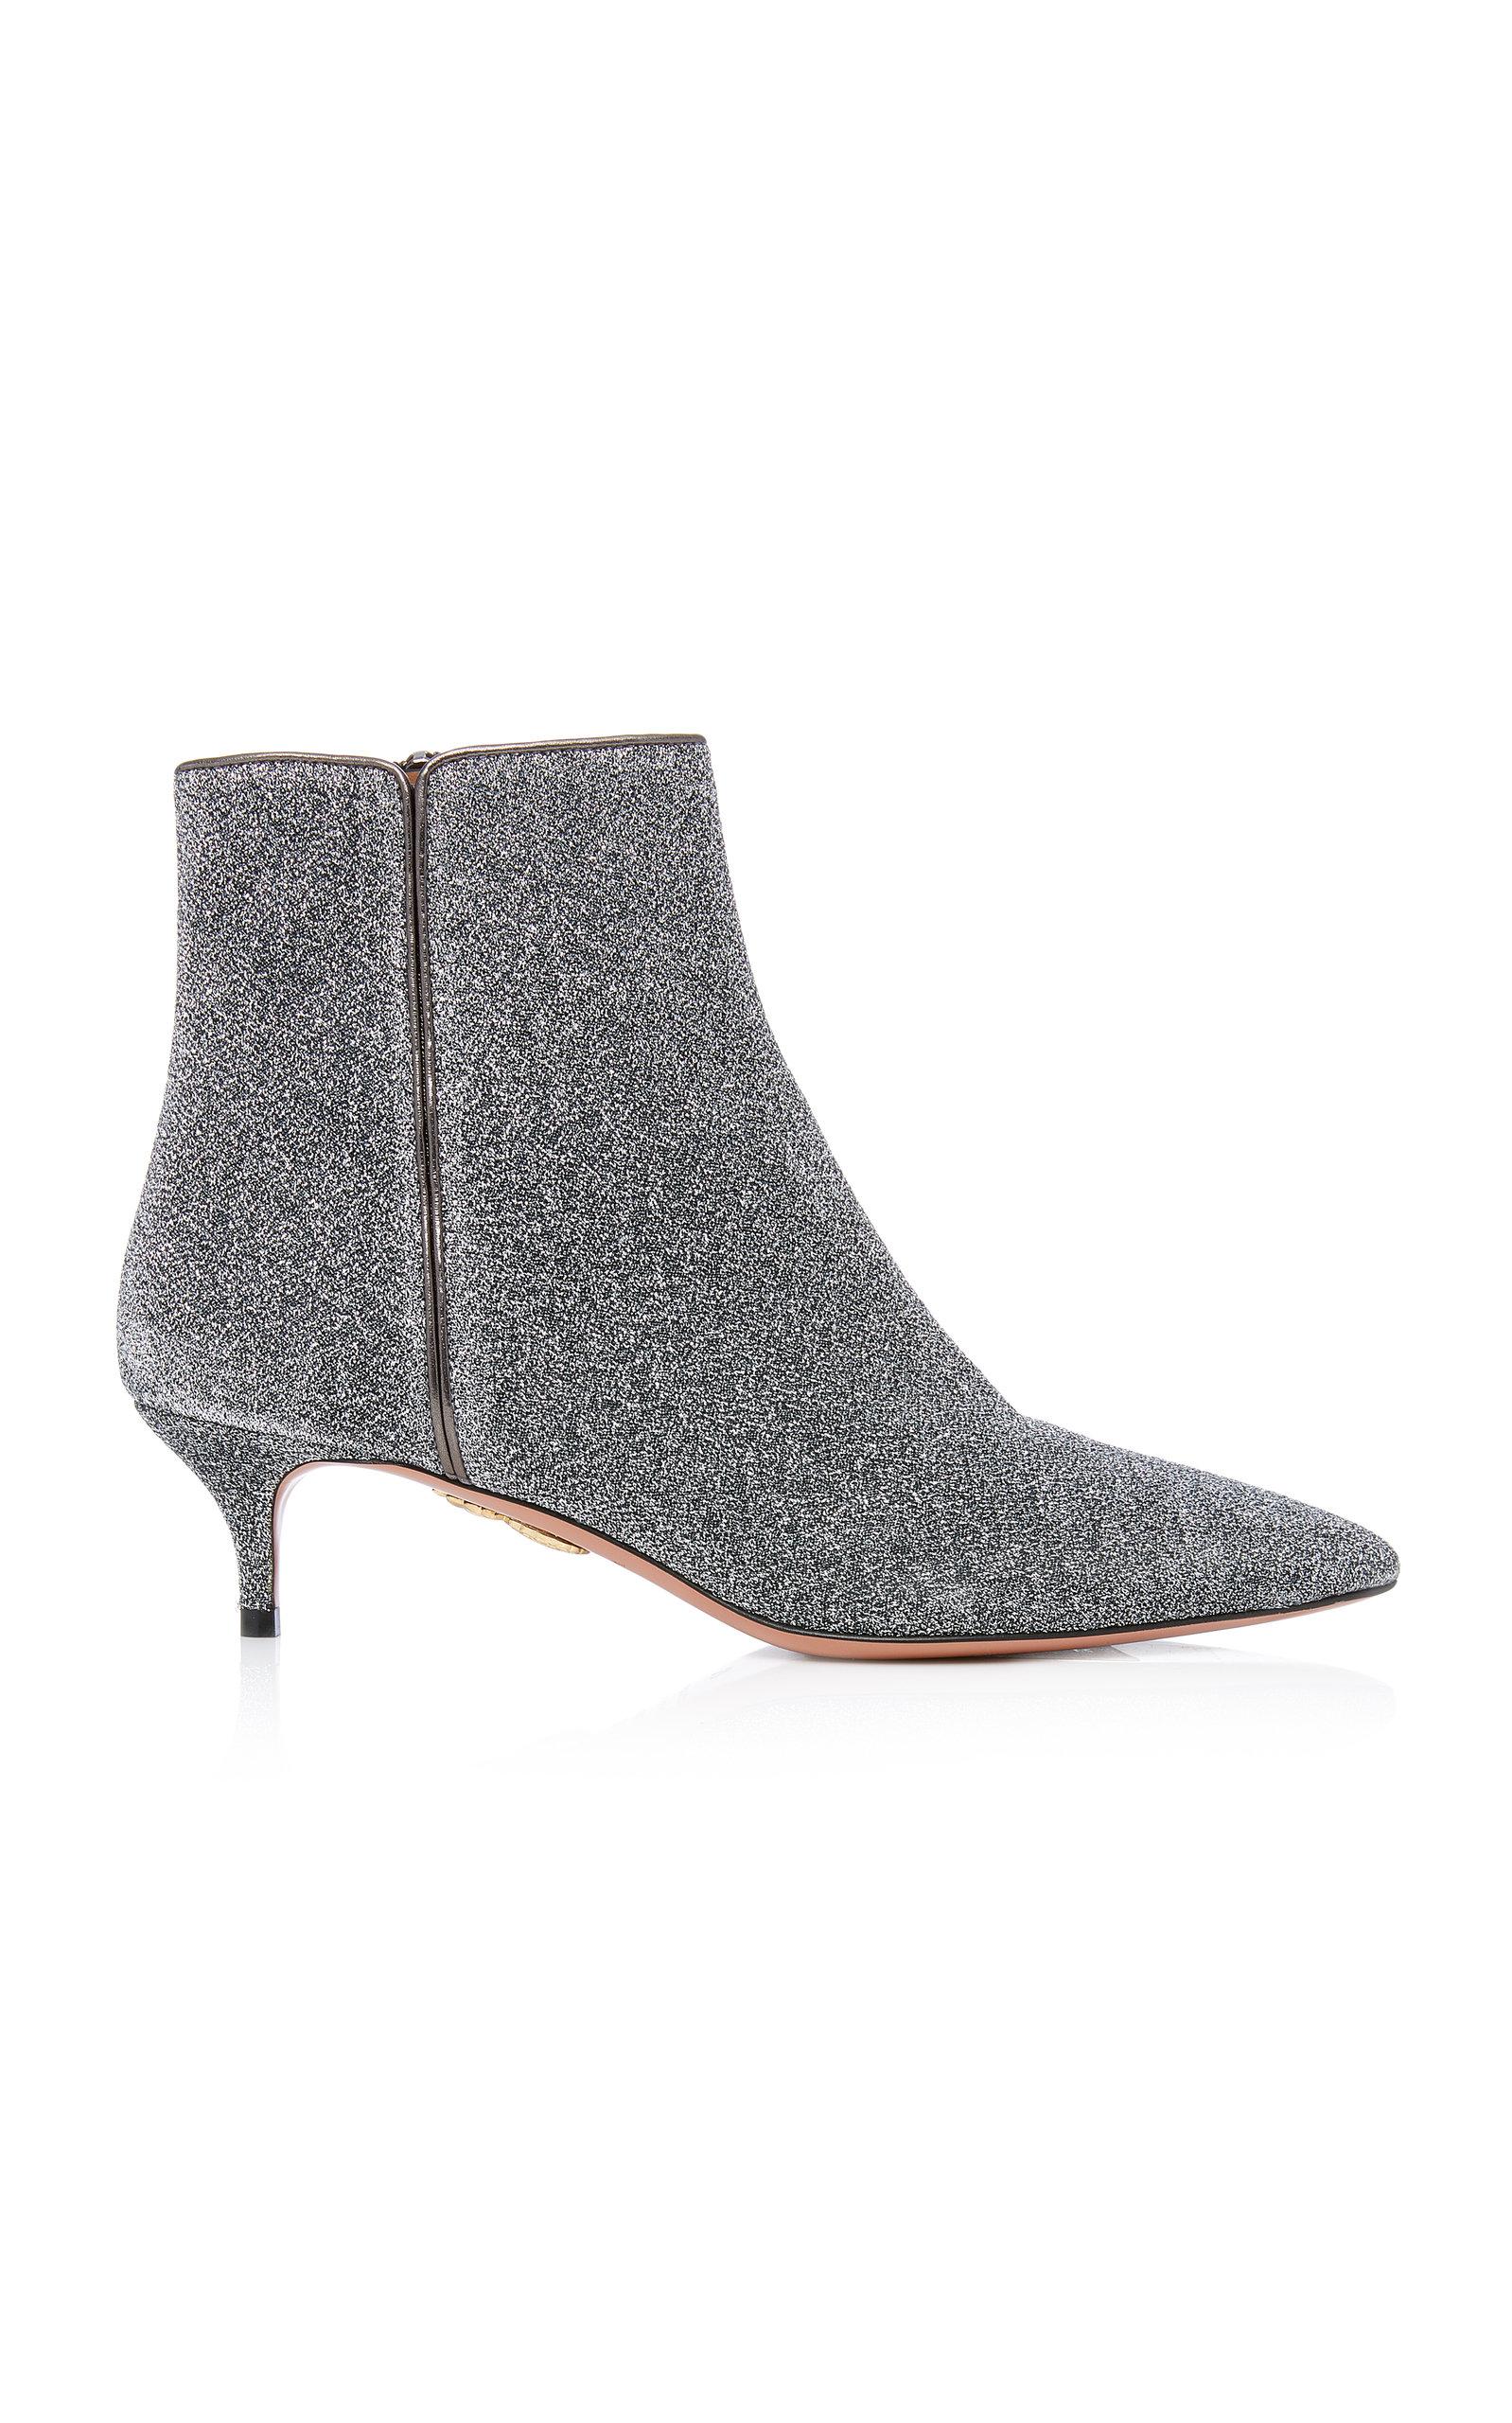 Quant Metallic Stretch-Knit Ankle BootsAquazzura mpd3y